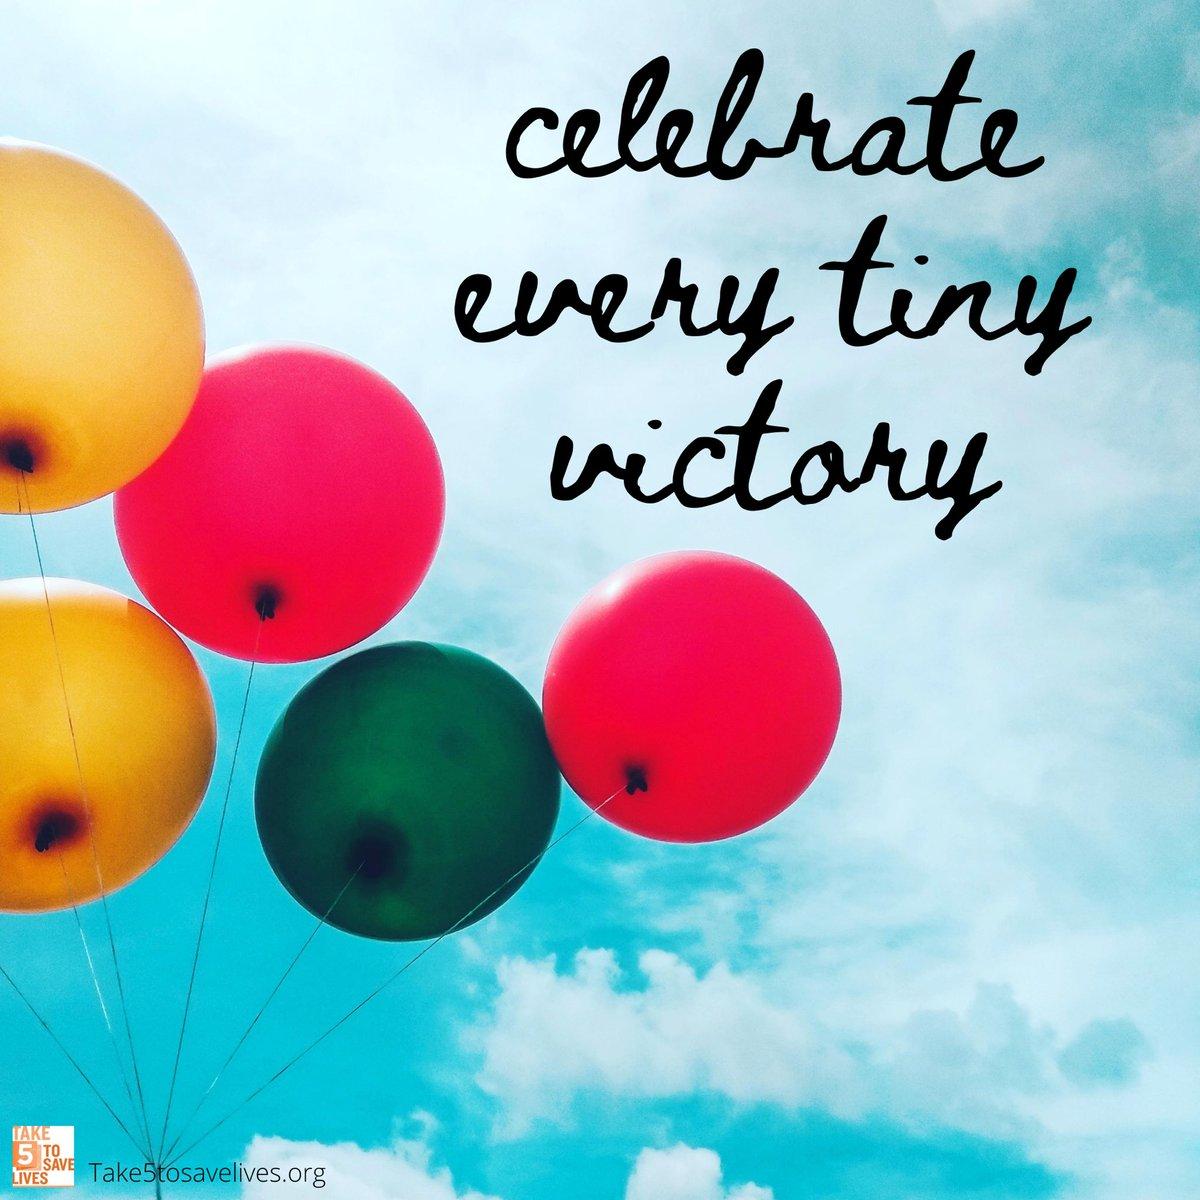 Celebrate how far you've come today.  #celebrateyourself #take5tosavelives #celebrate #celebratelife #celebration #bepositive #celebratelove #gratitude #memories #friends #family #job #accomplishments #marriage #unforgettable #bestoftheday #blessed #animals #positiveoutlook